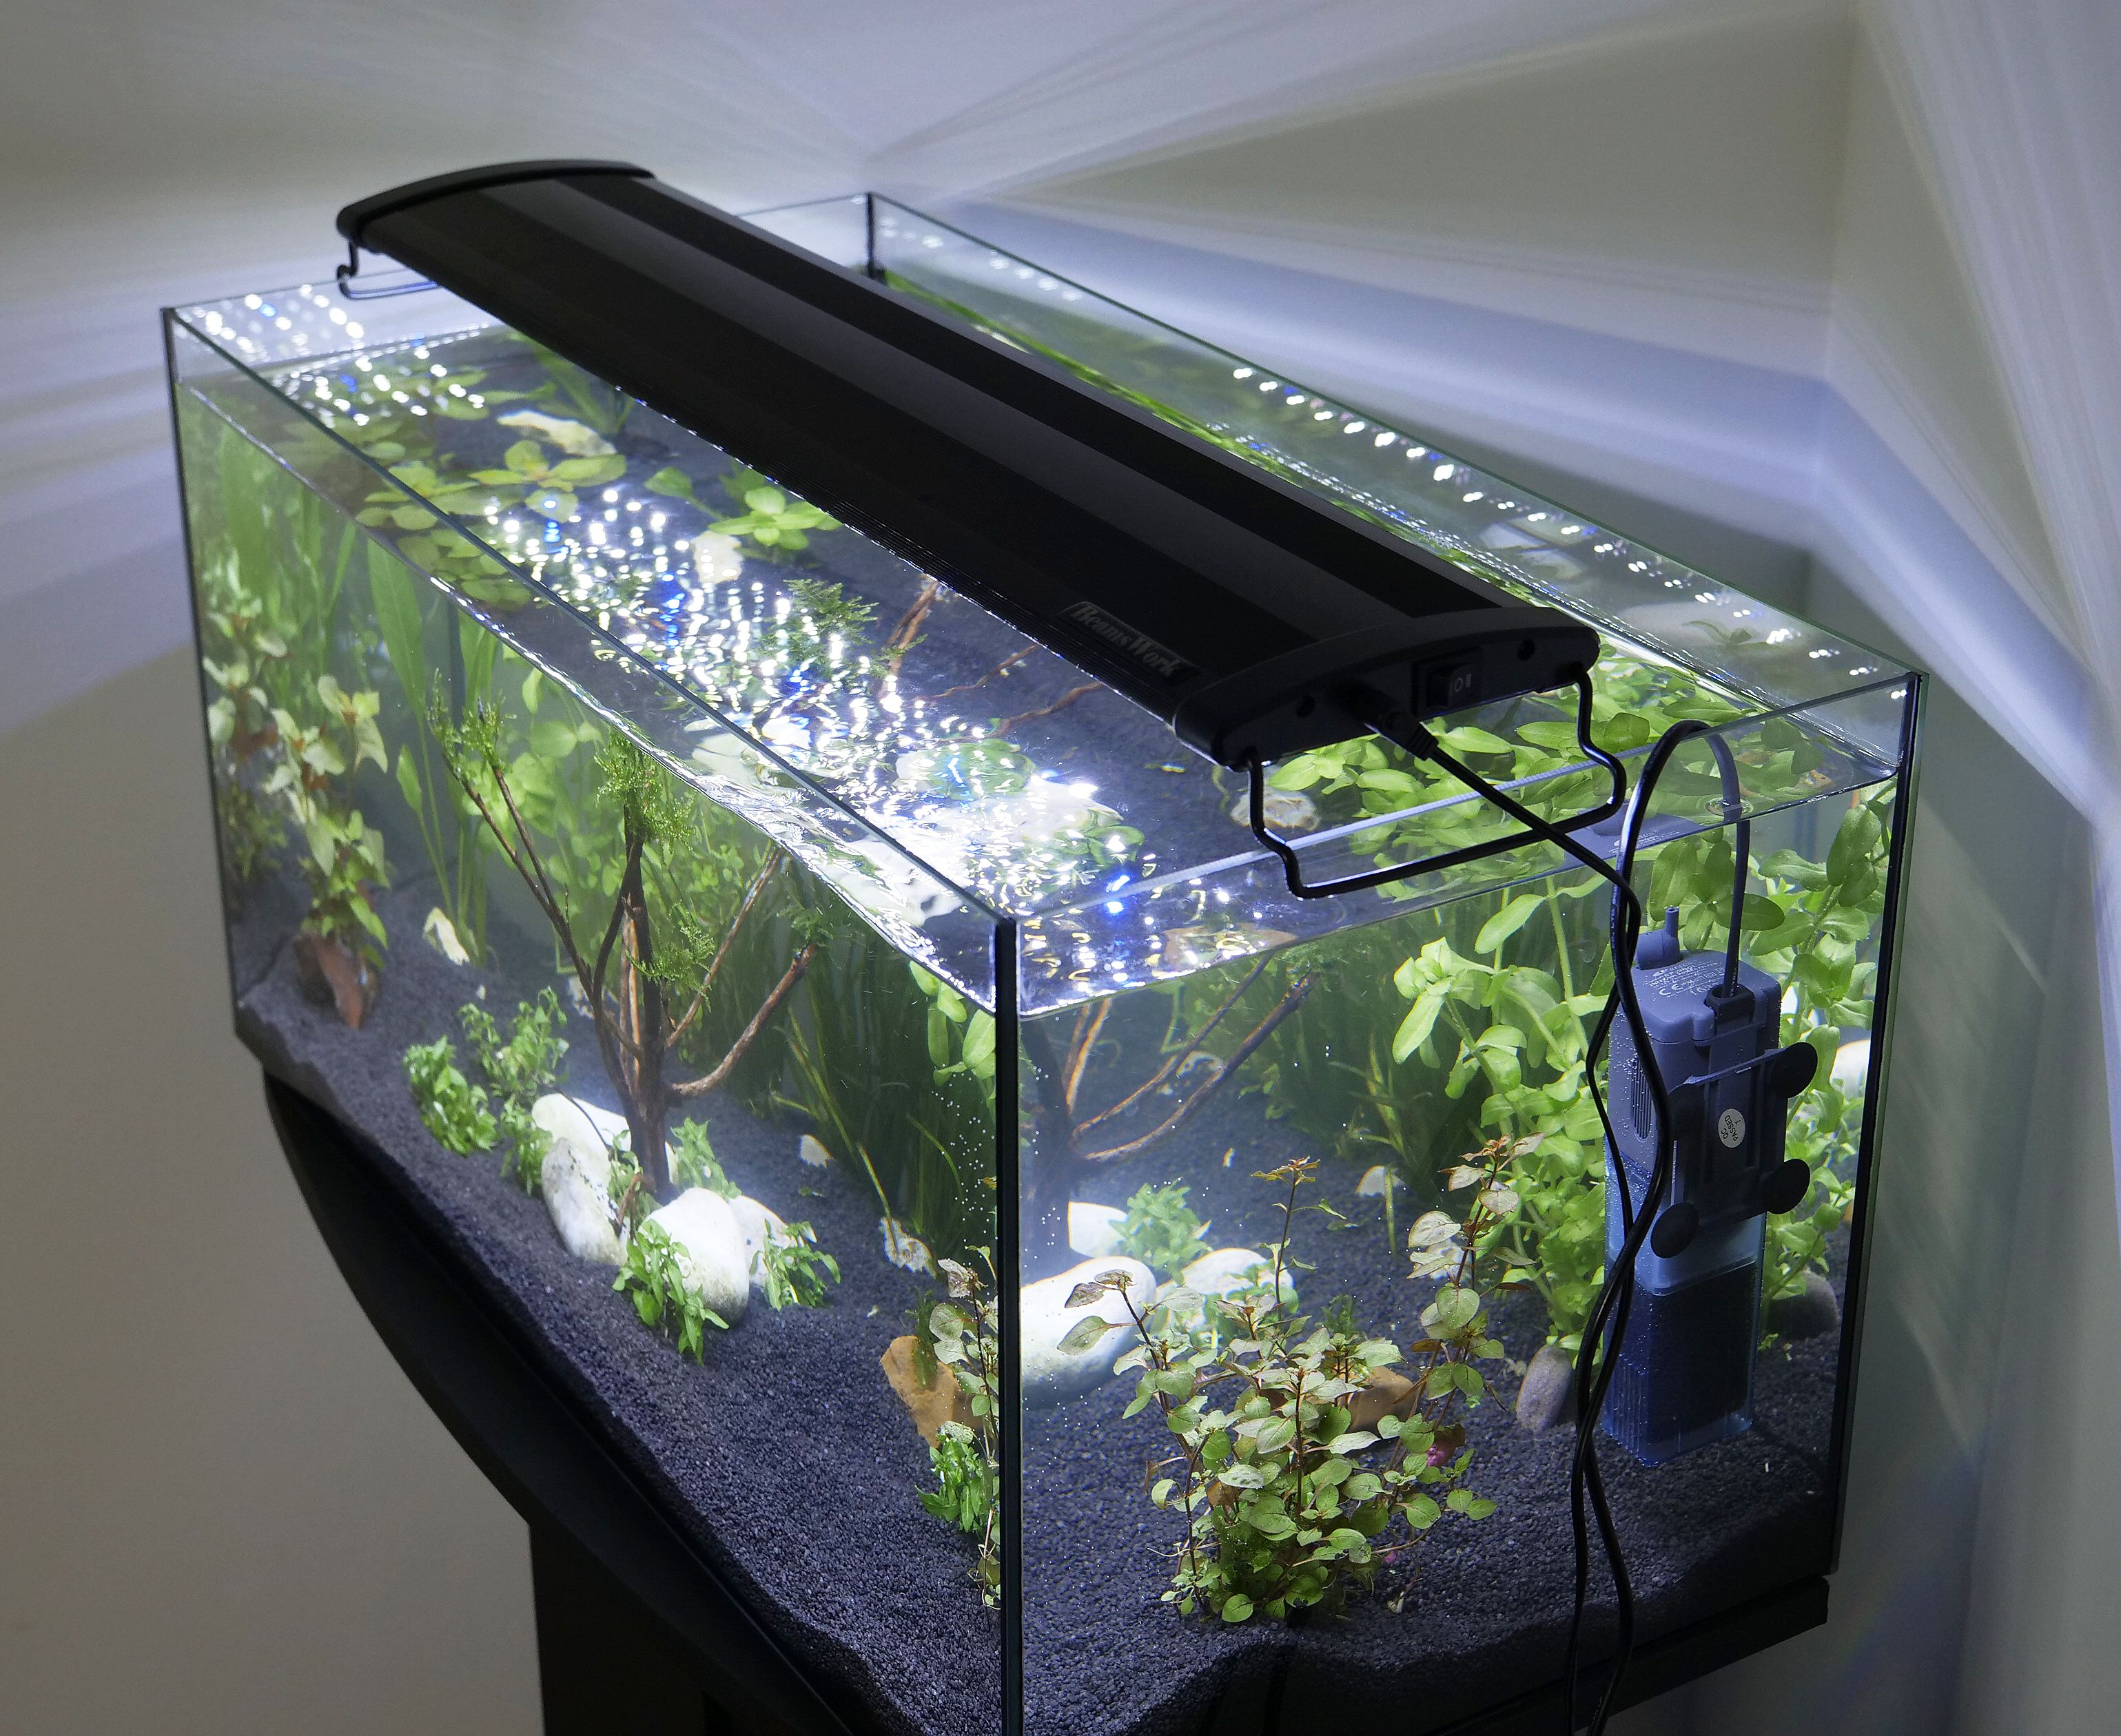 led aufsatzleuchte f r 150 160cm aquarium 60 w 5640 lumen hi power beamswork ebay. Black Bedroom Furniture Sets. Home Design Ideas